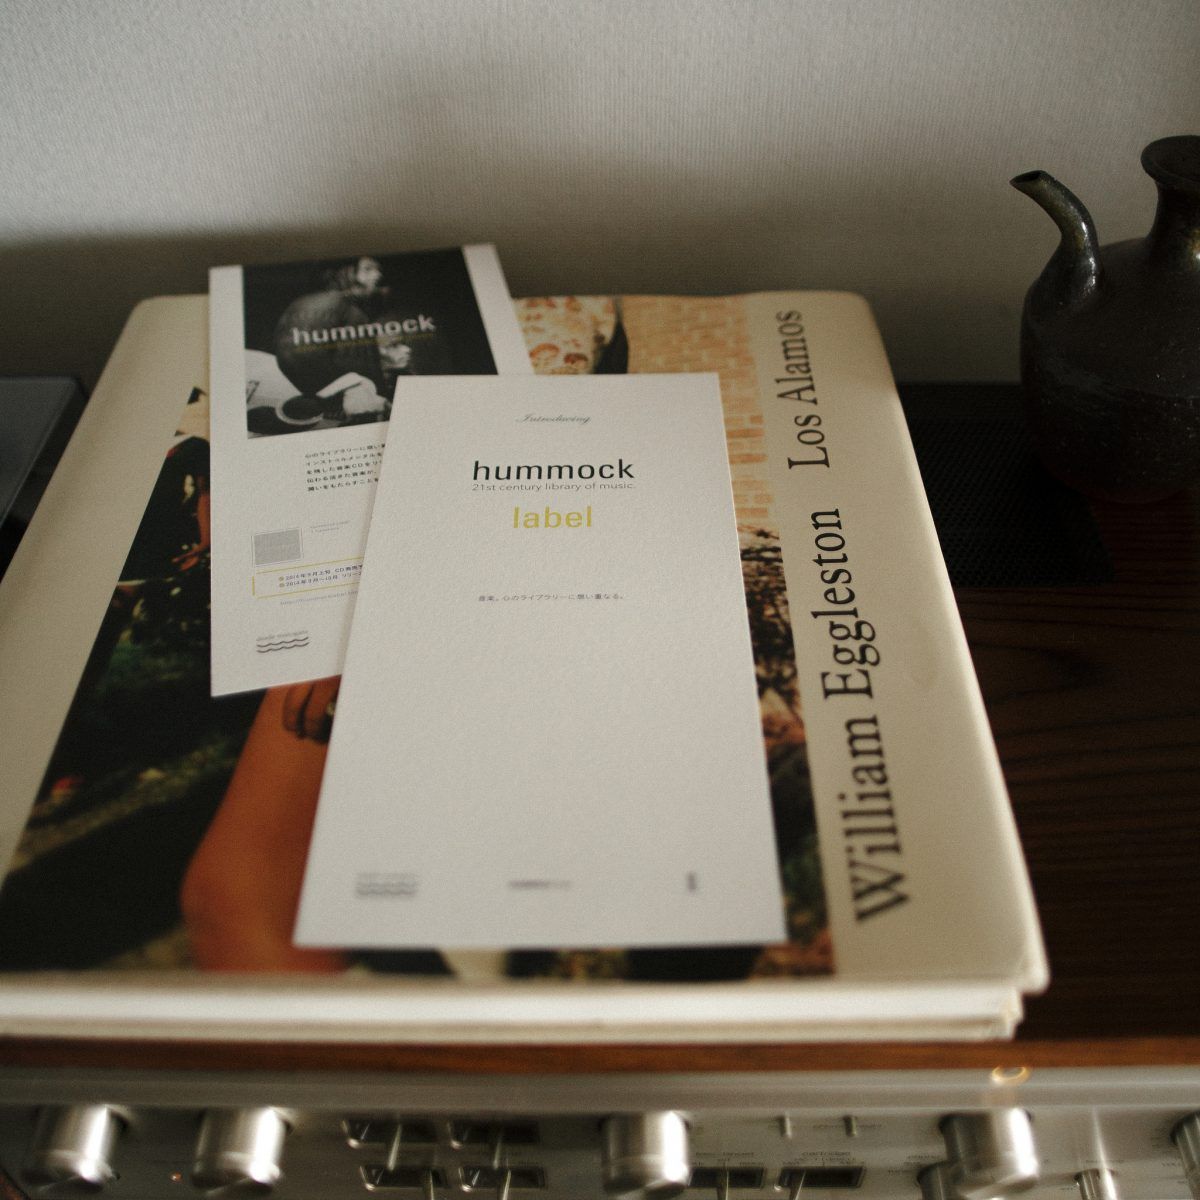 Hummock Label|21th Century Libraryof Music|Introducing Card|グラフィックデザイン ブランドデザイン|兵庫県姫路市